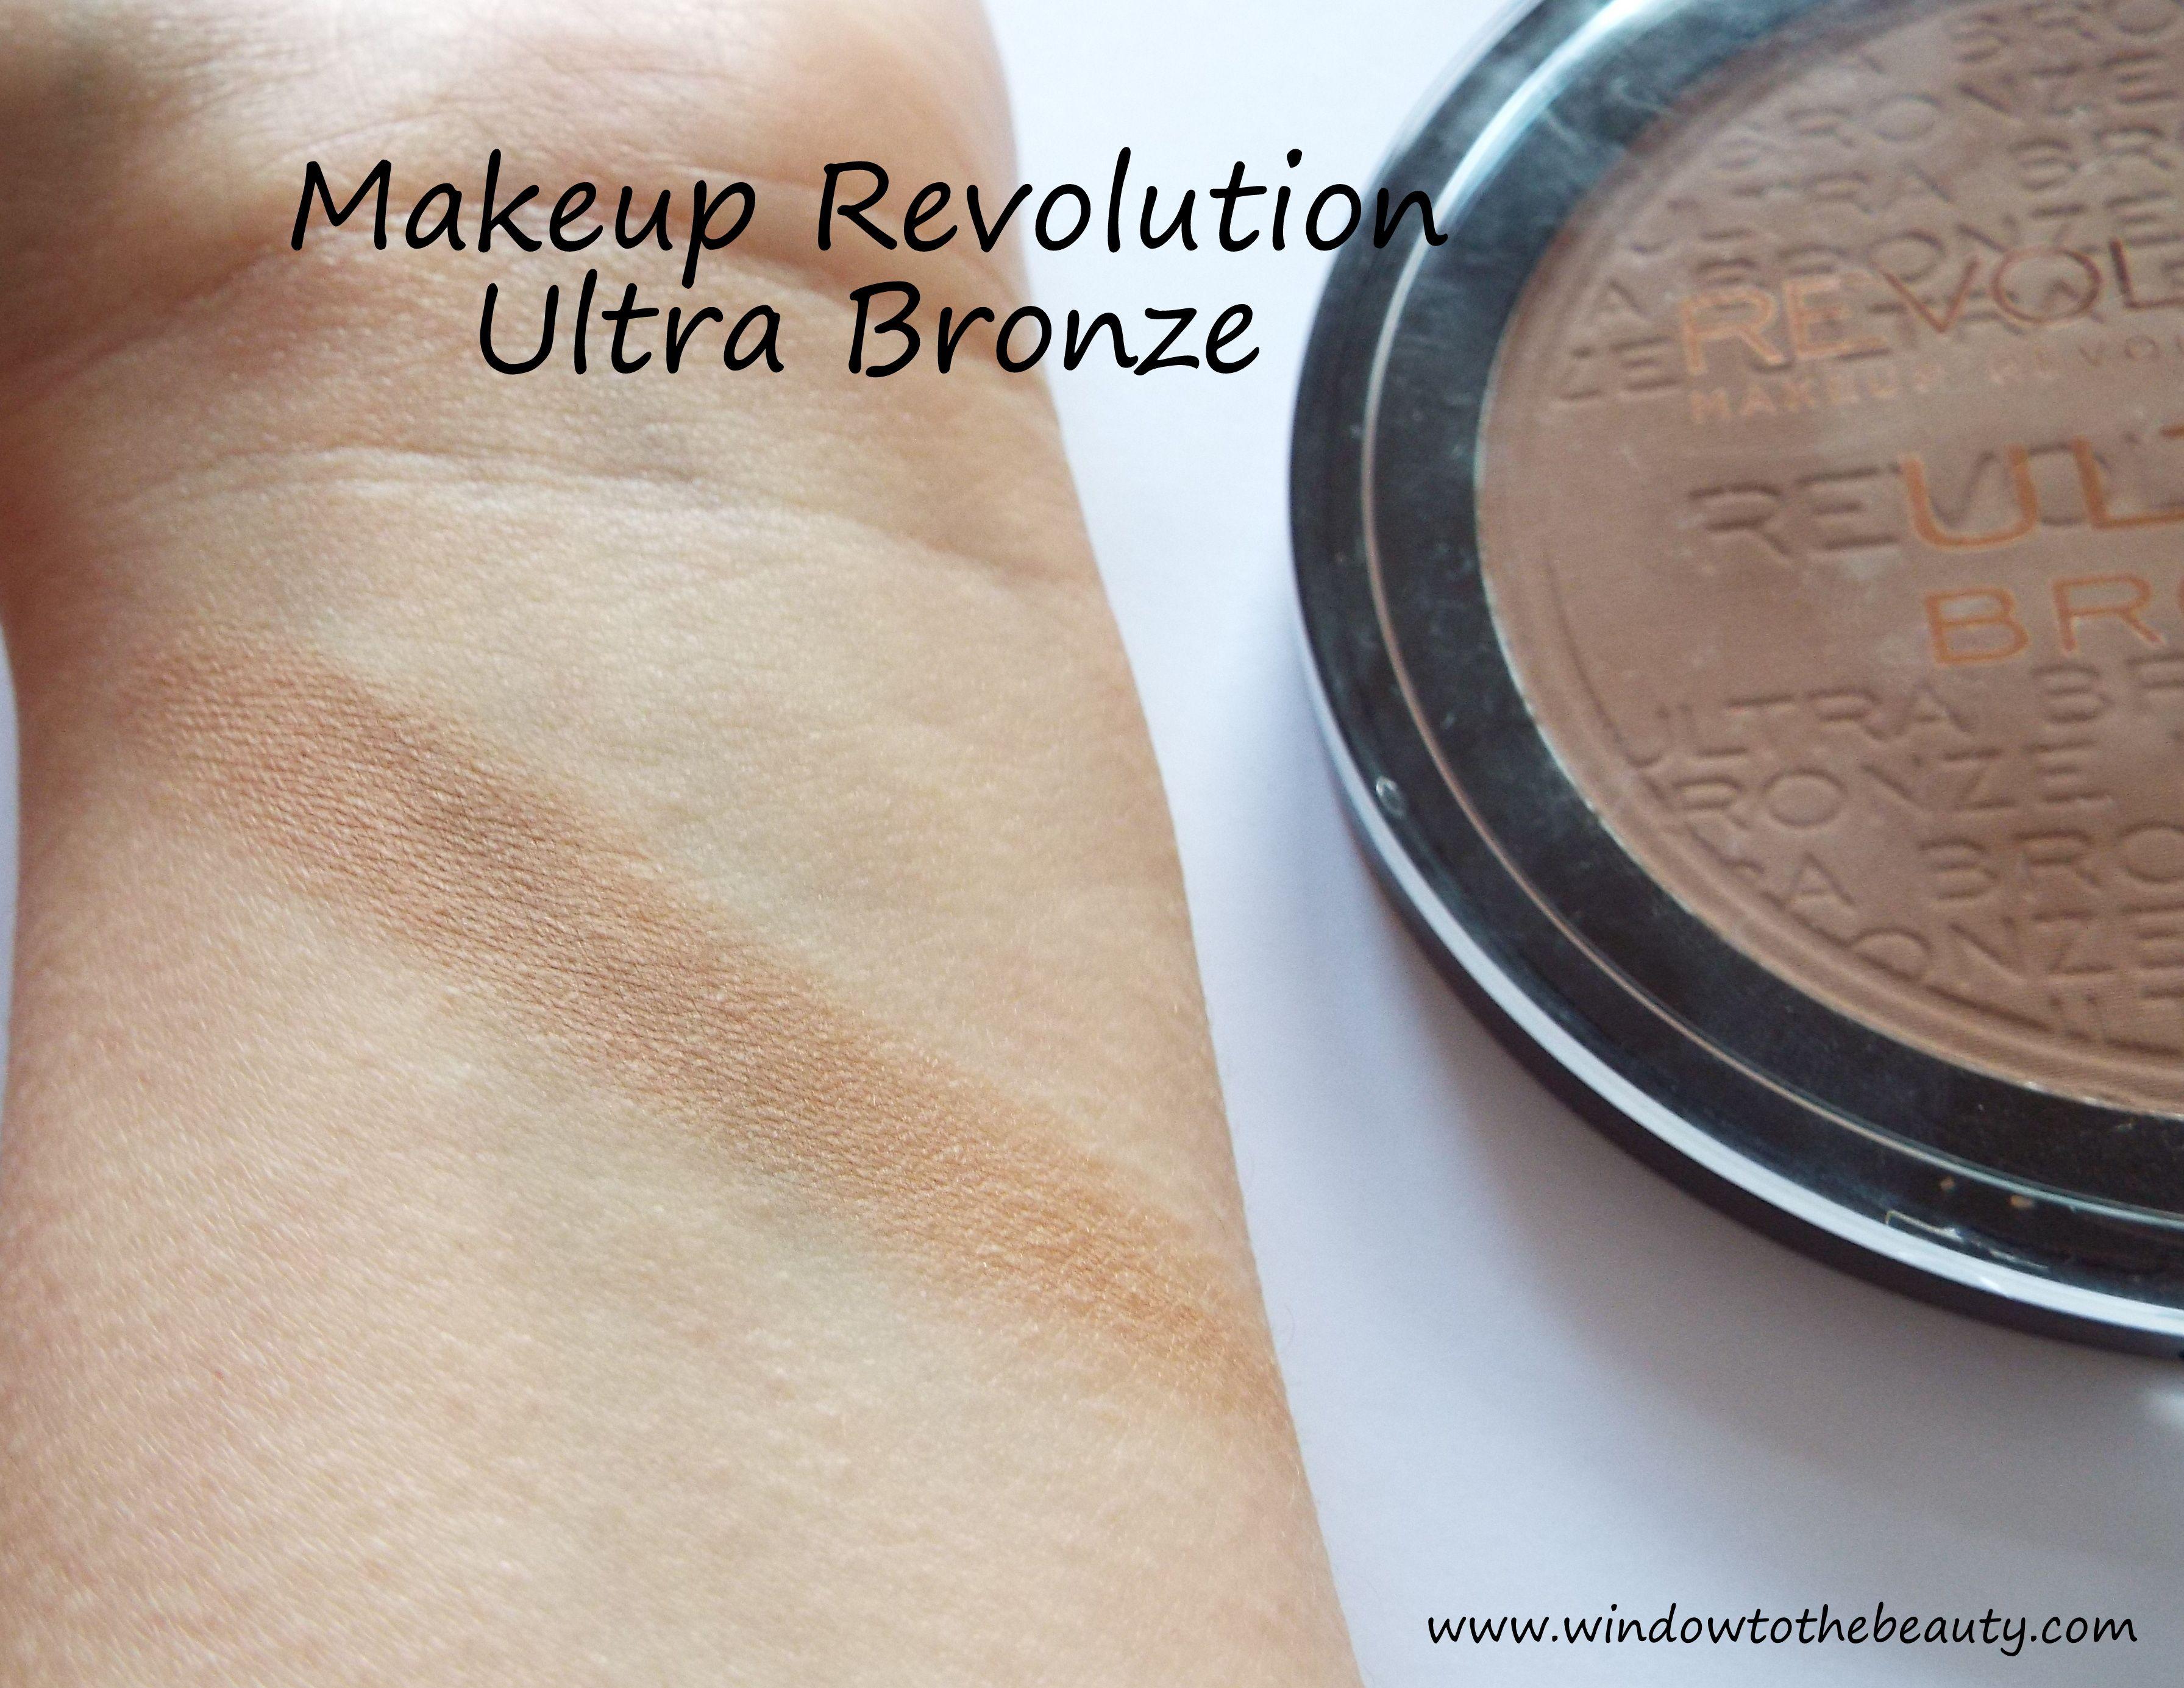 Makeup Revolution Ultra Bronze Makeup revolution, Makeup